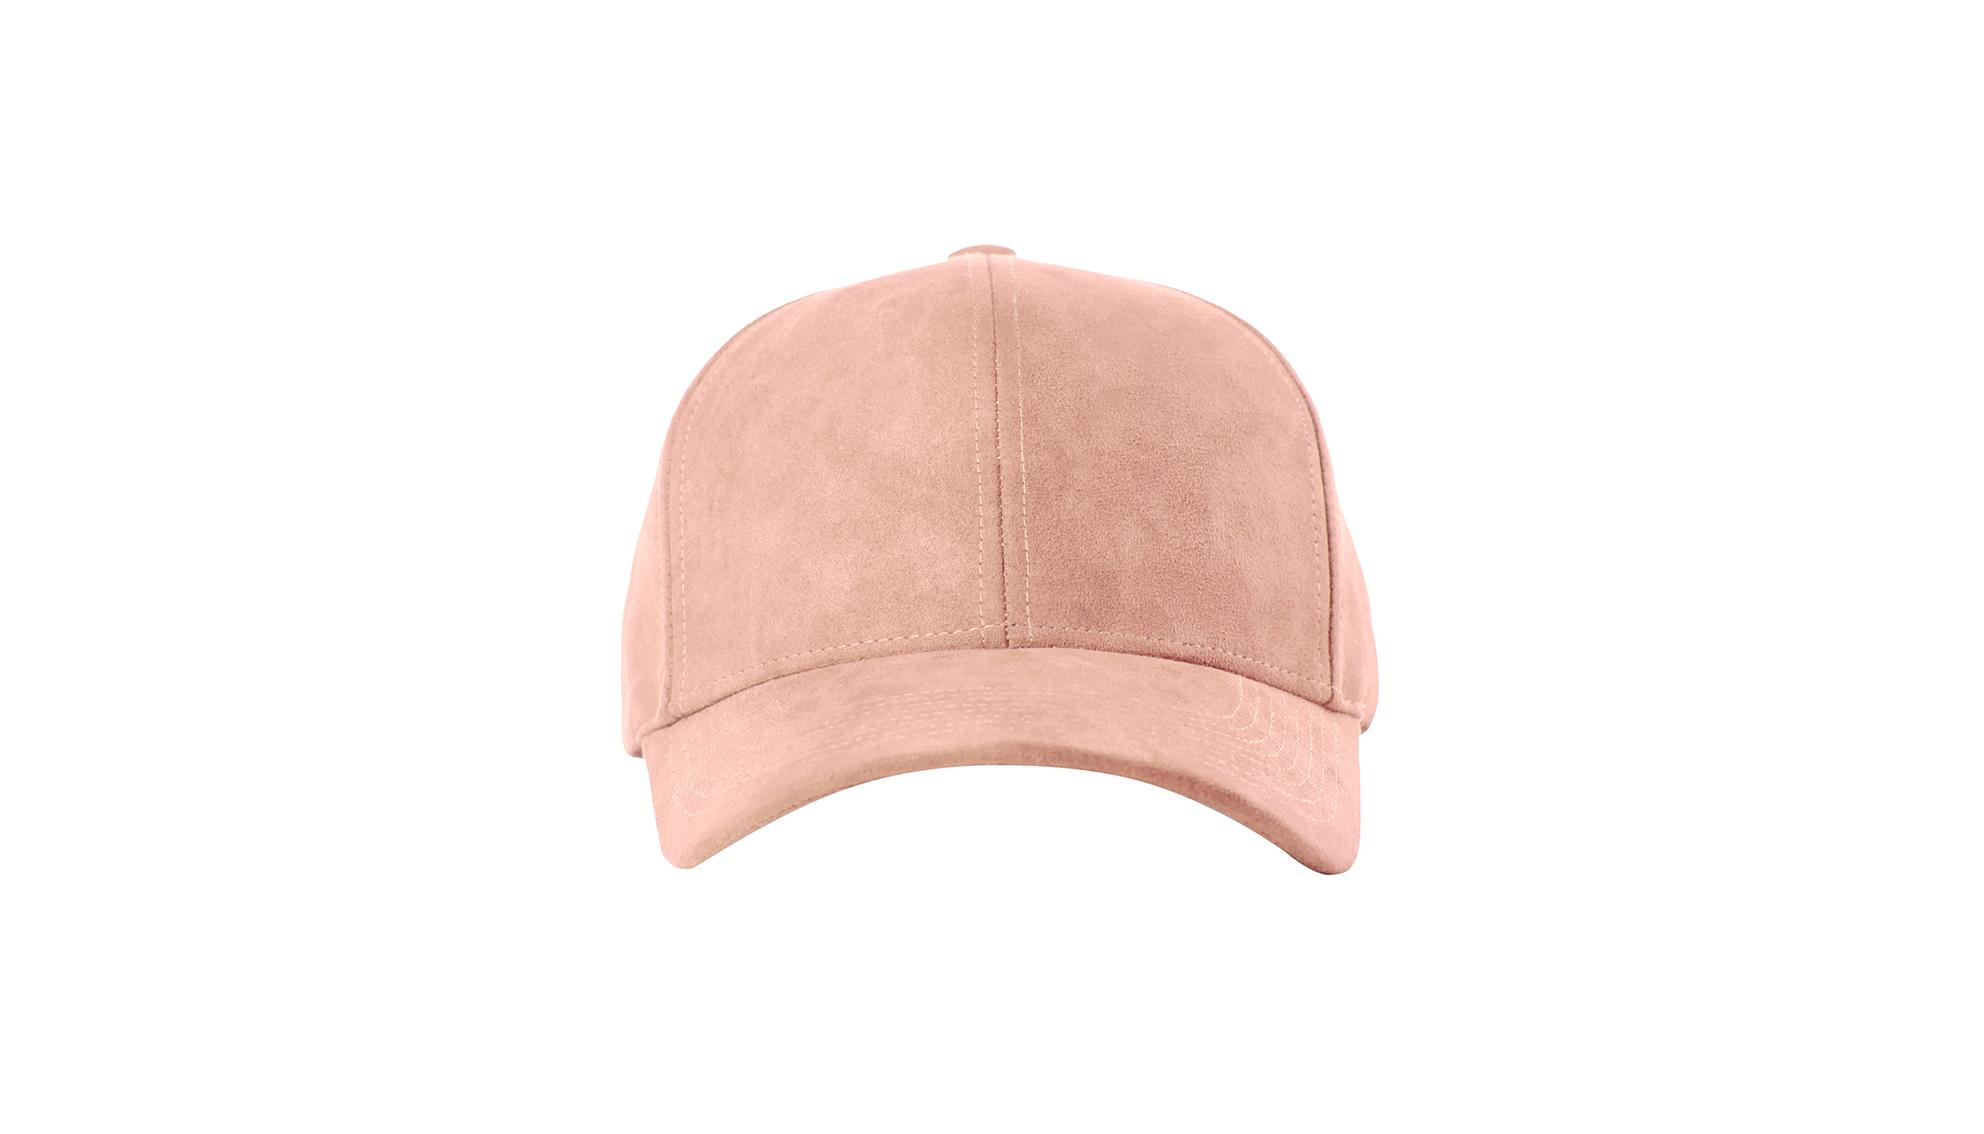 9c0533b6ac7 DSLINE BASEBALL CAP CLOUD ROSE SUEDE   GOLD - DSLINE BASICS